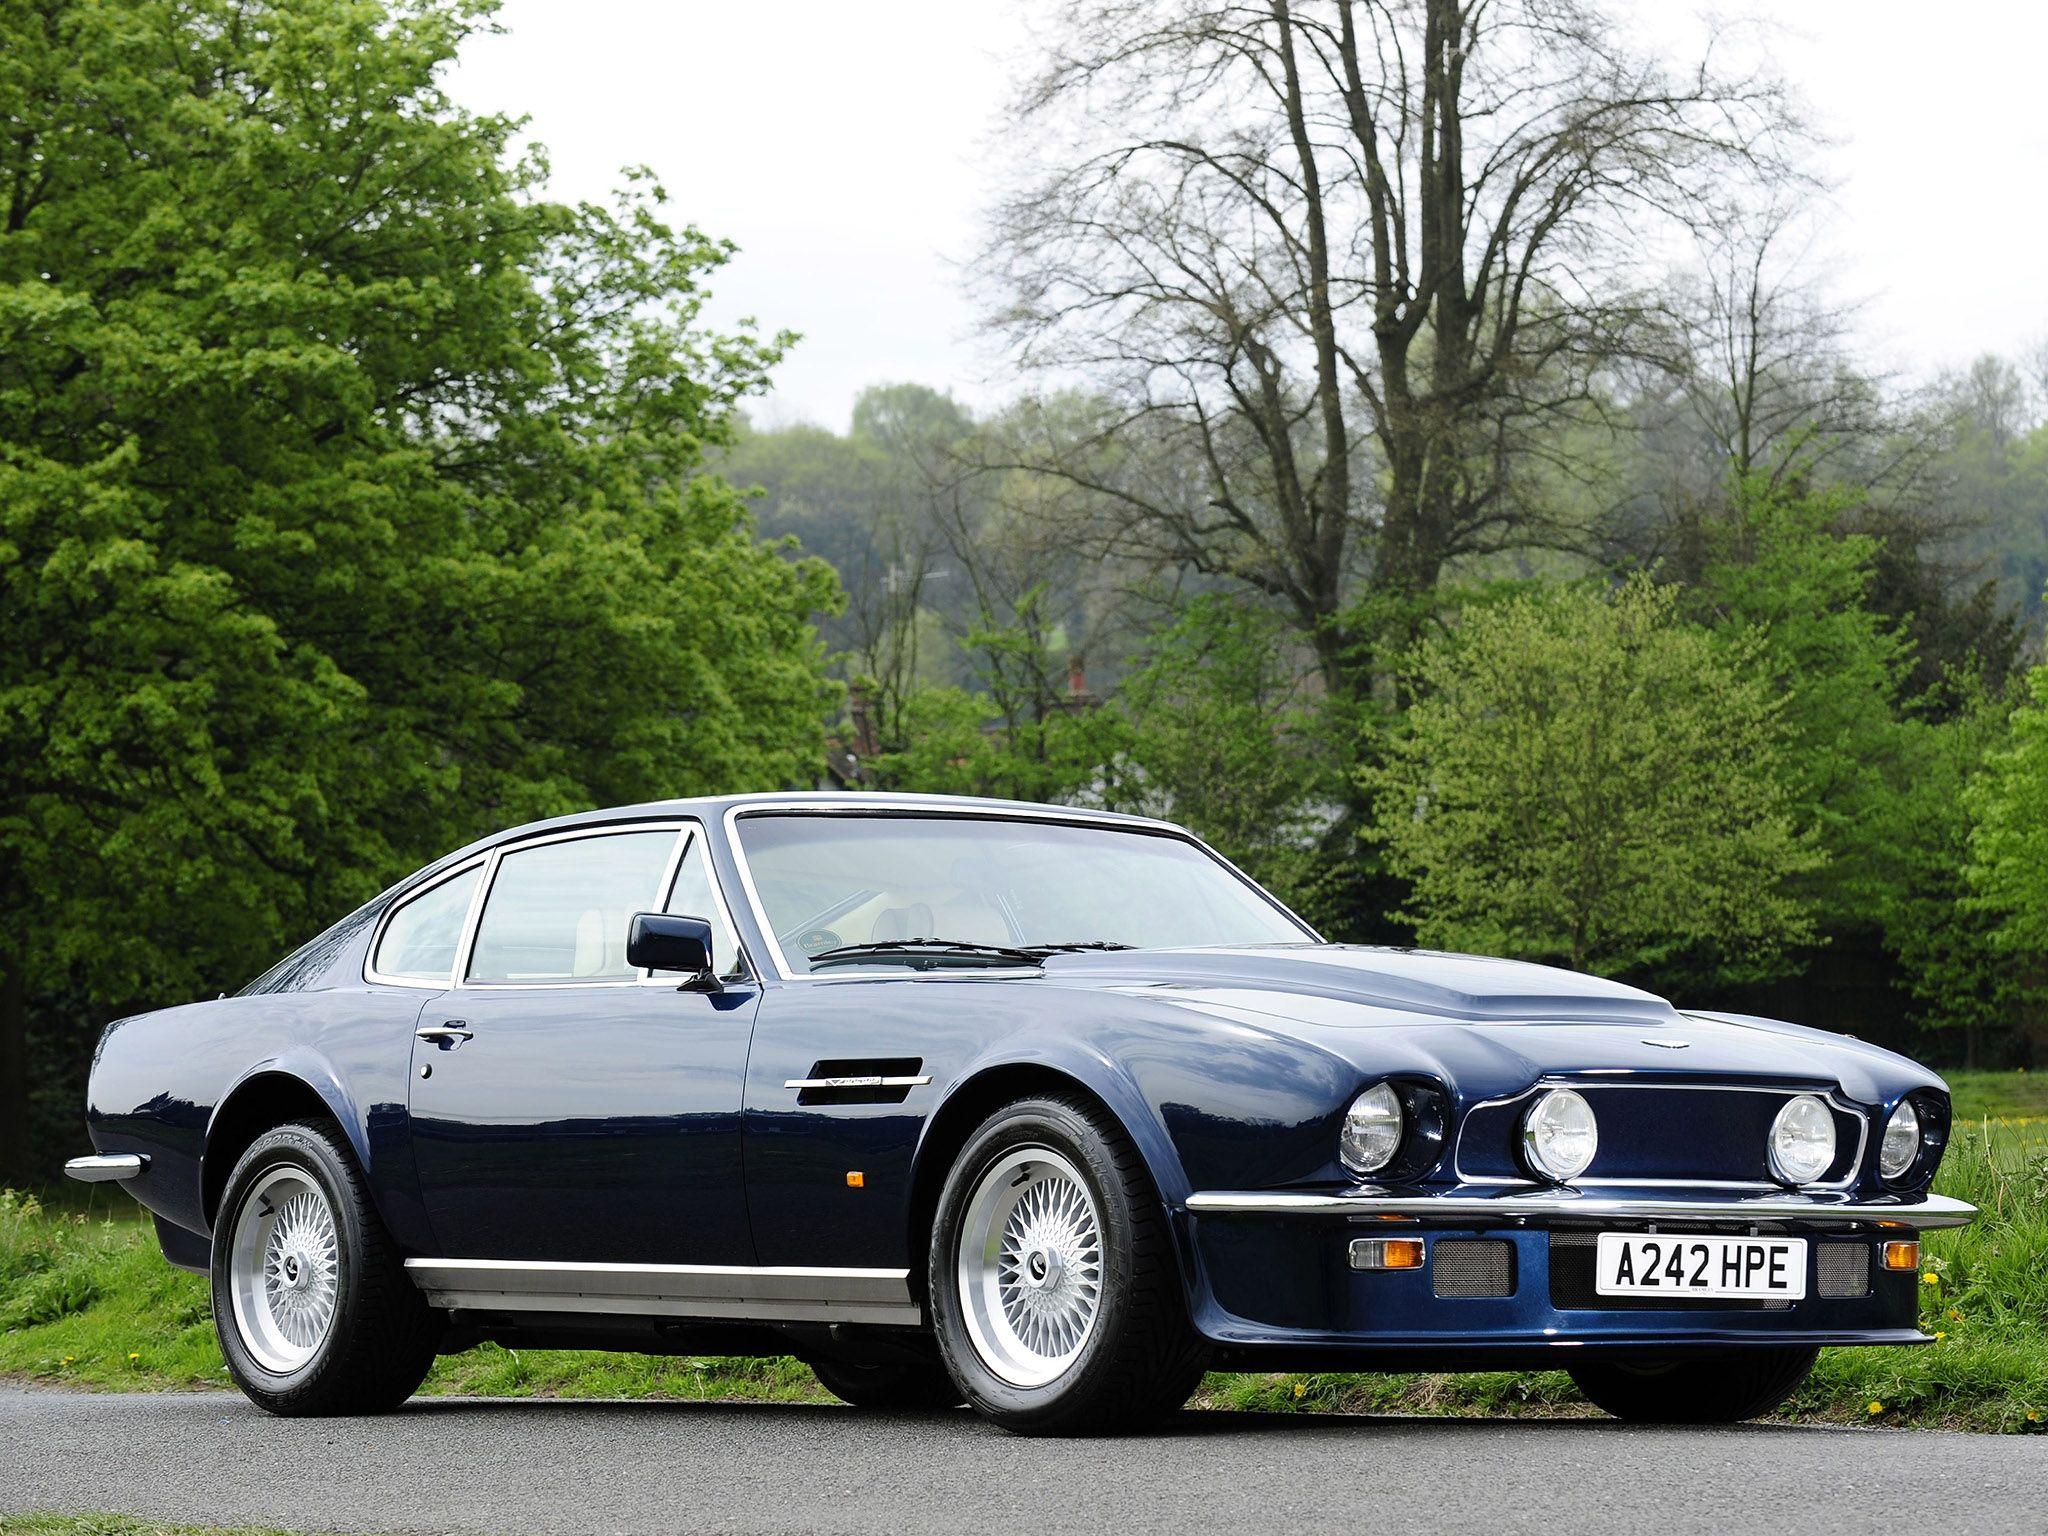 1977 Aston Martin V8 Vantage Aston Martin V8 Aston Martin Aston Martin Cars